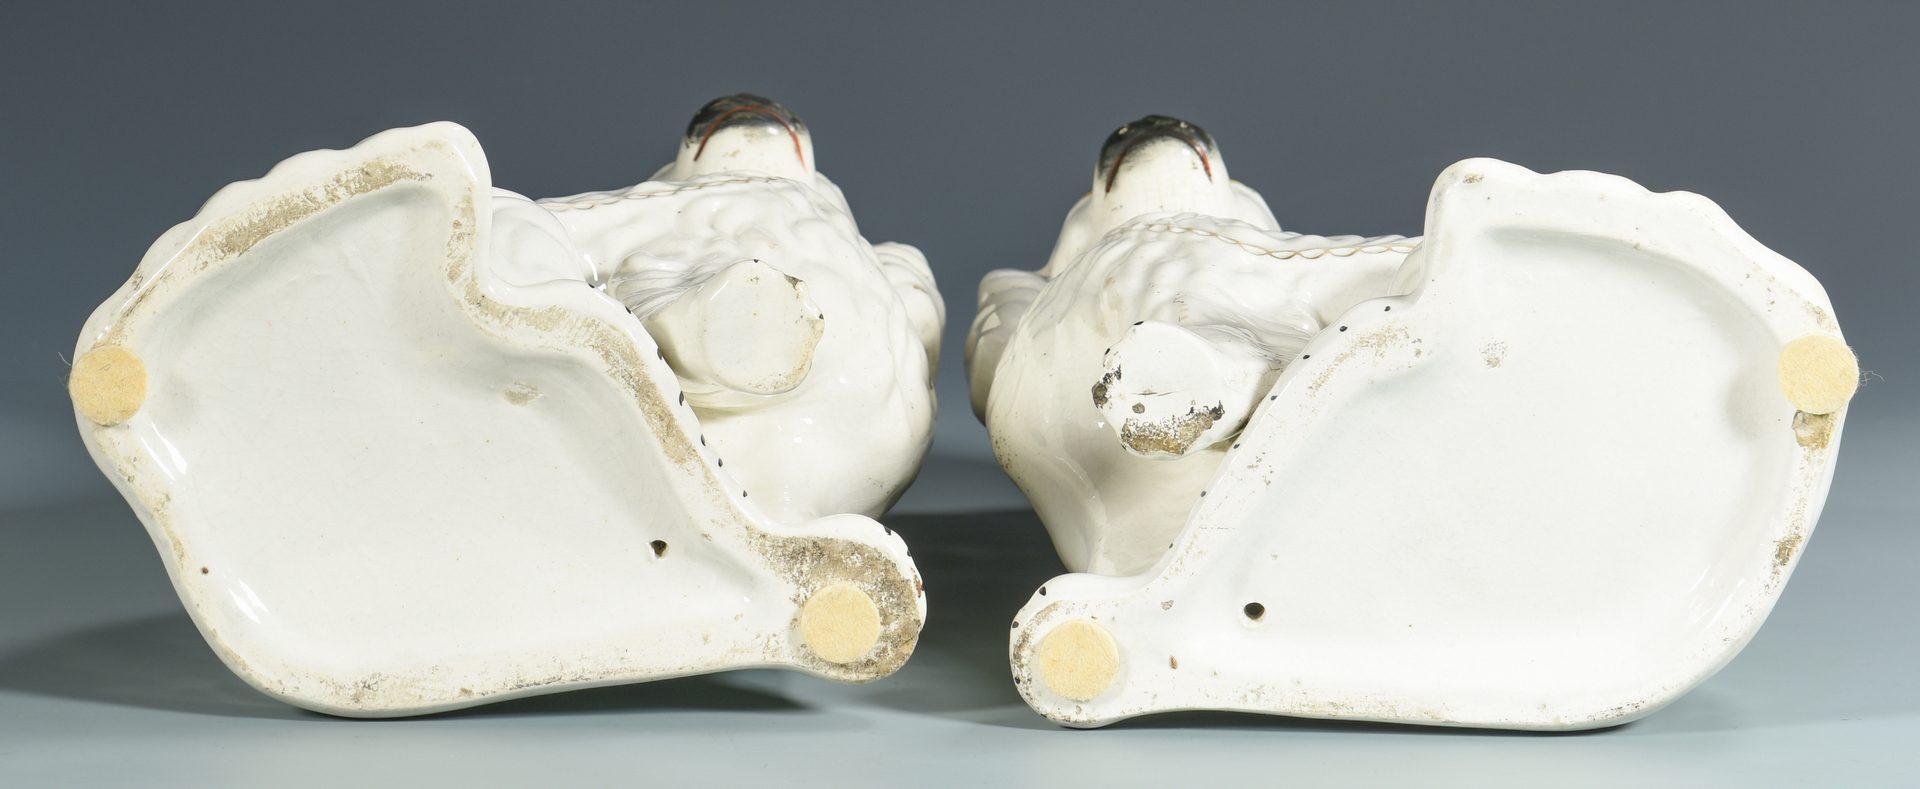 Lot 703: 6 English Staffordshire Pottery Items